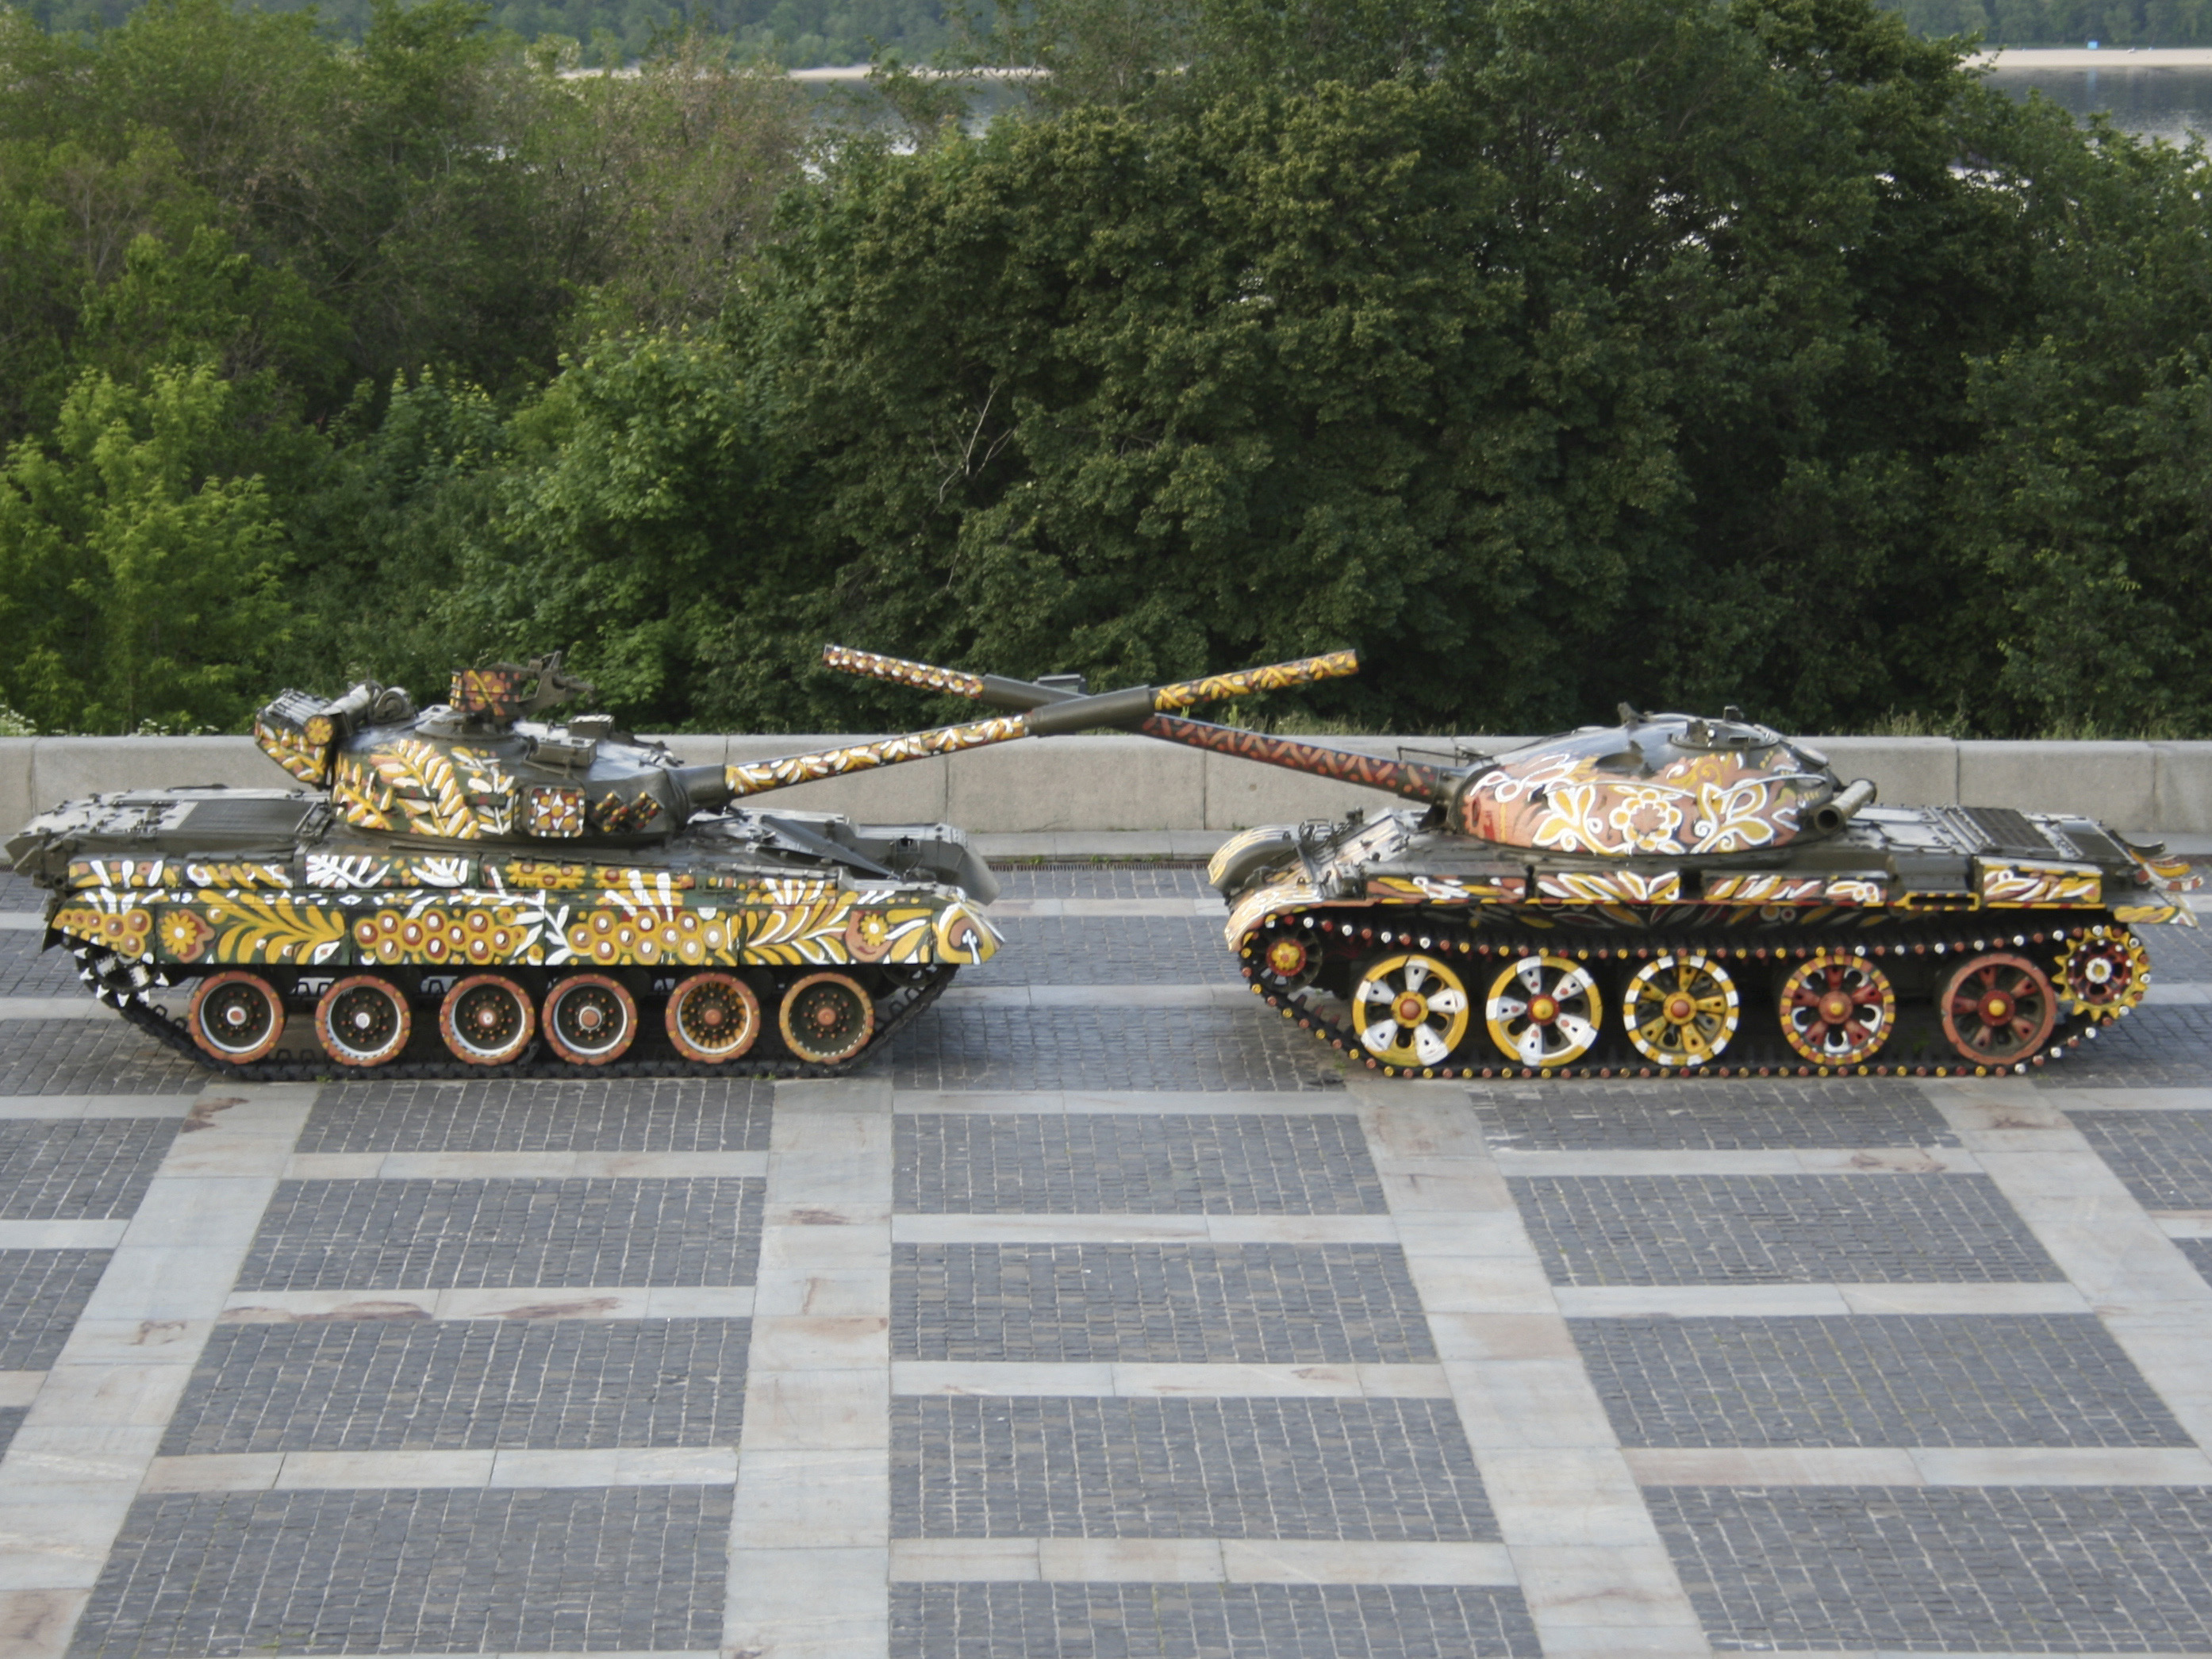 фото танк тюнинг теперь